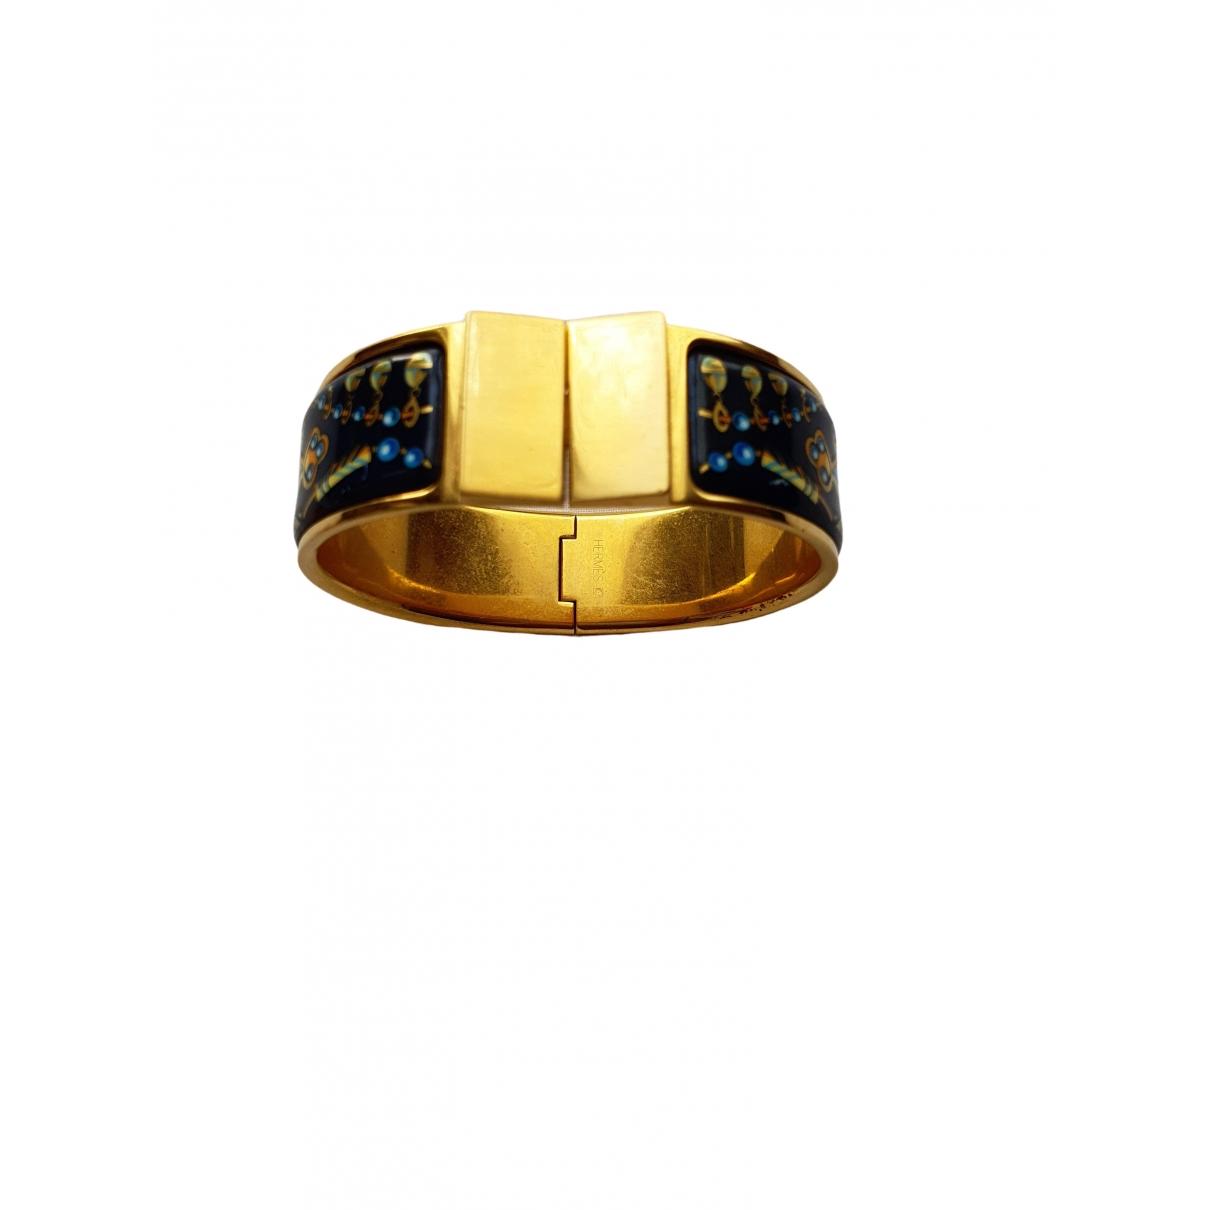 Hermes - Bracelet Bracelet Charniere pour femme en metal - dore